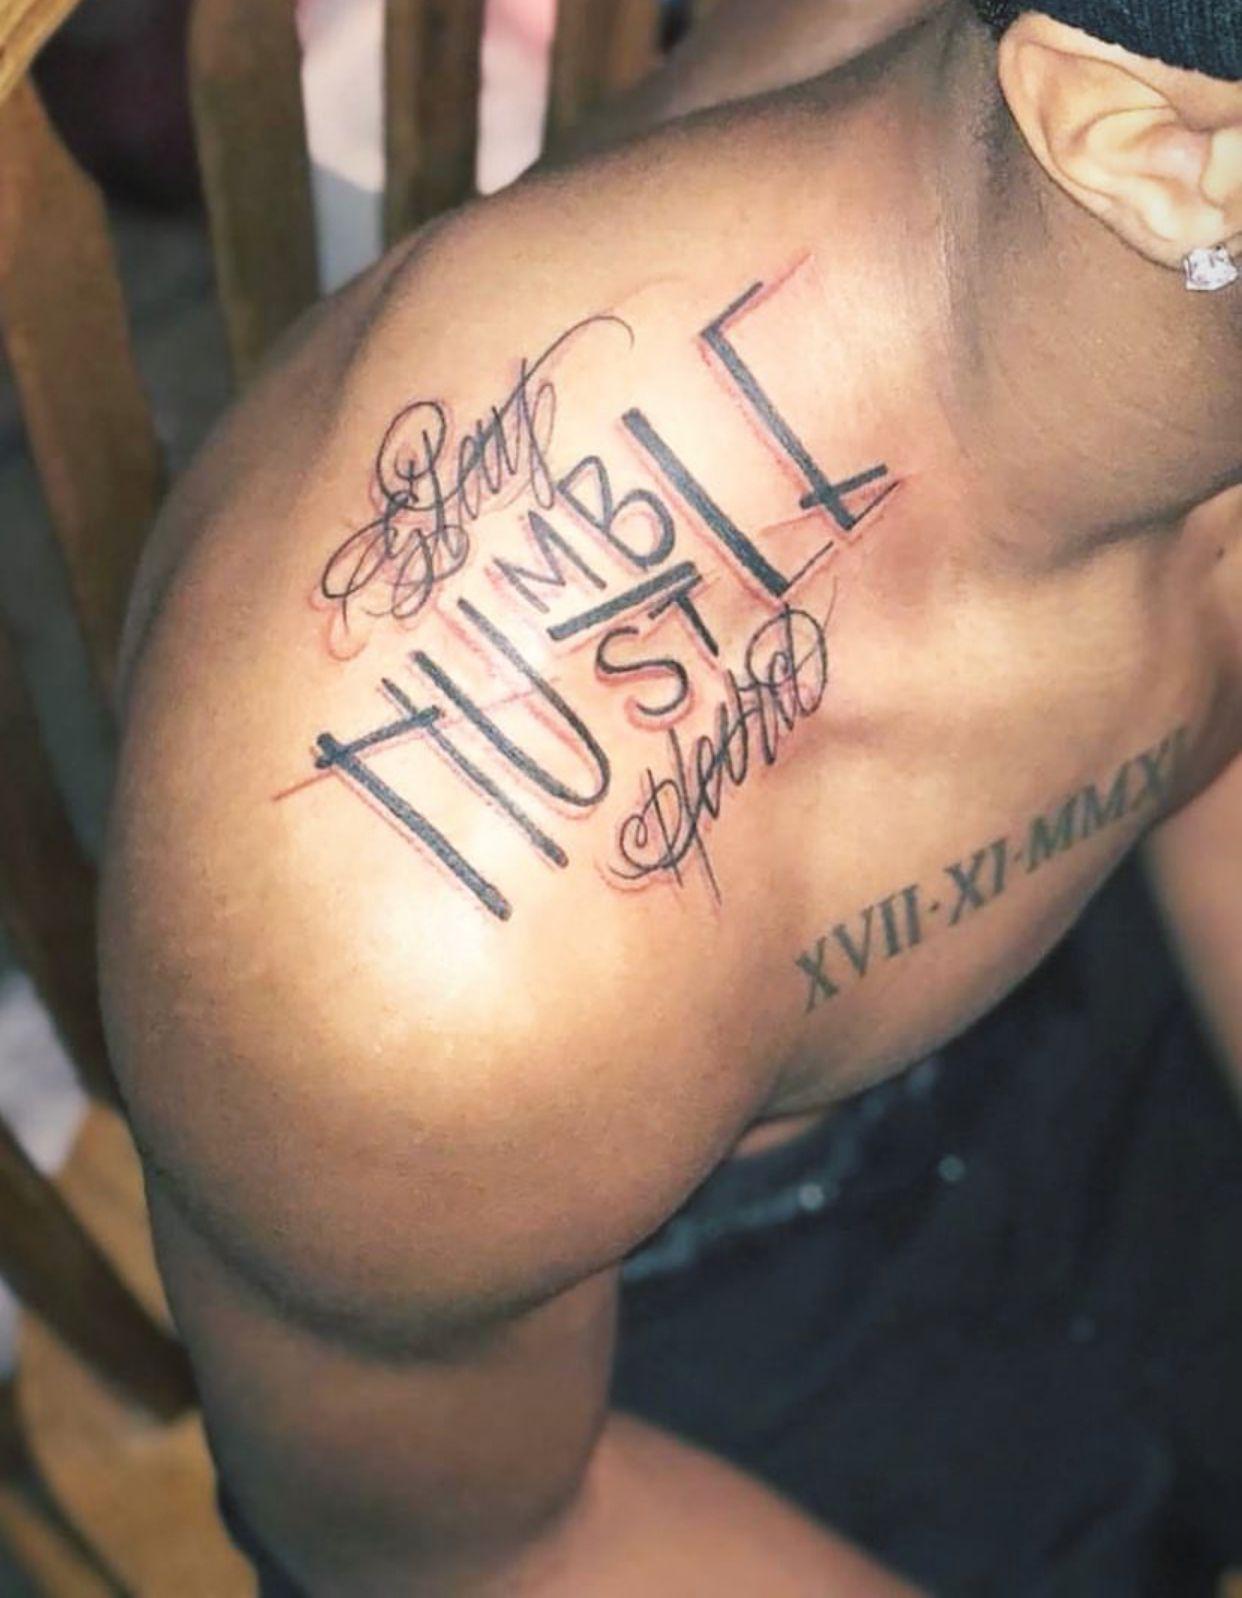 Humble Tattoo On Arm : humble, tattoo, Humble/st, Tattoo, Tattoos,, Tattoos, Guys,, Humble